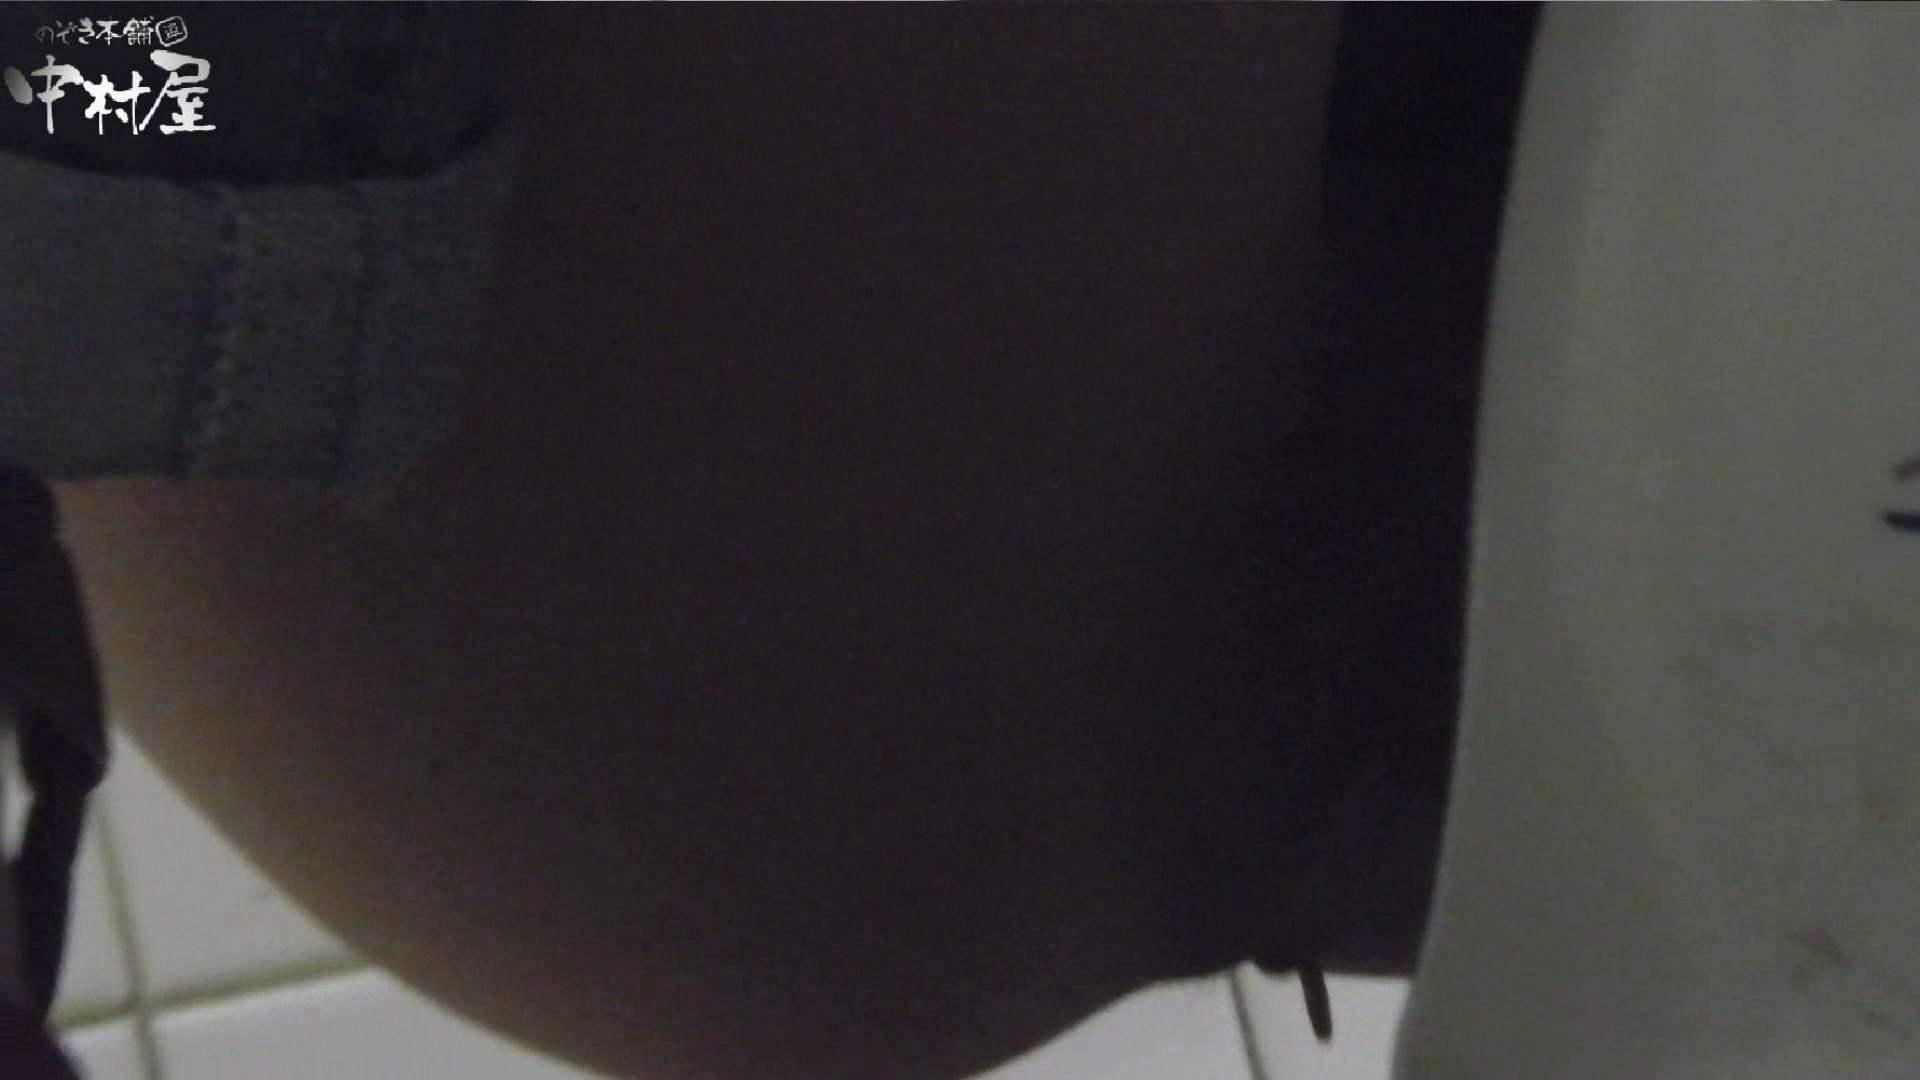 vol.49 命がけ潜伏洗面所! ポニテたんのソフトなブツ・推定180g 潜入シリーズ  74Pix 4